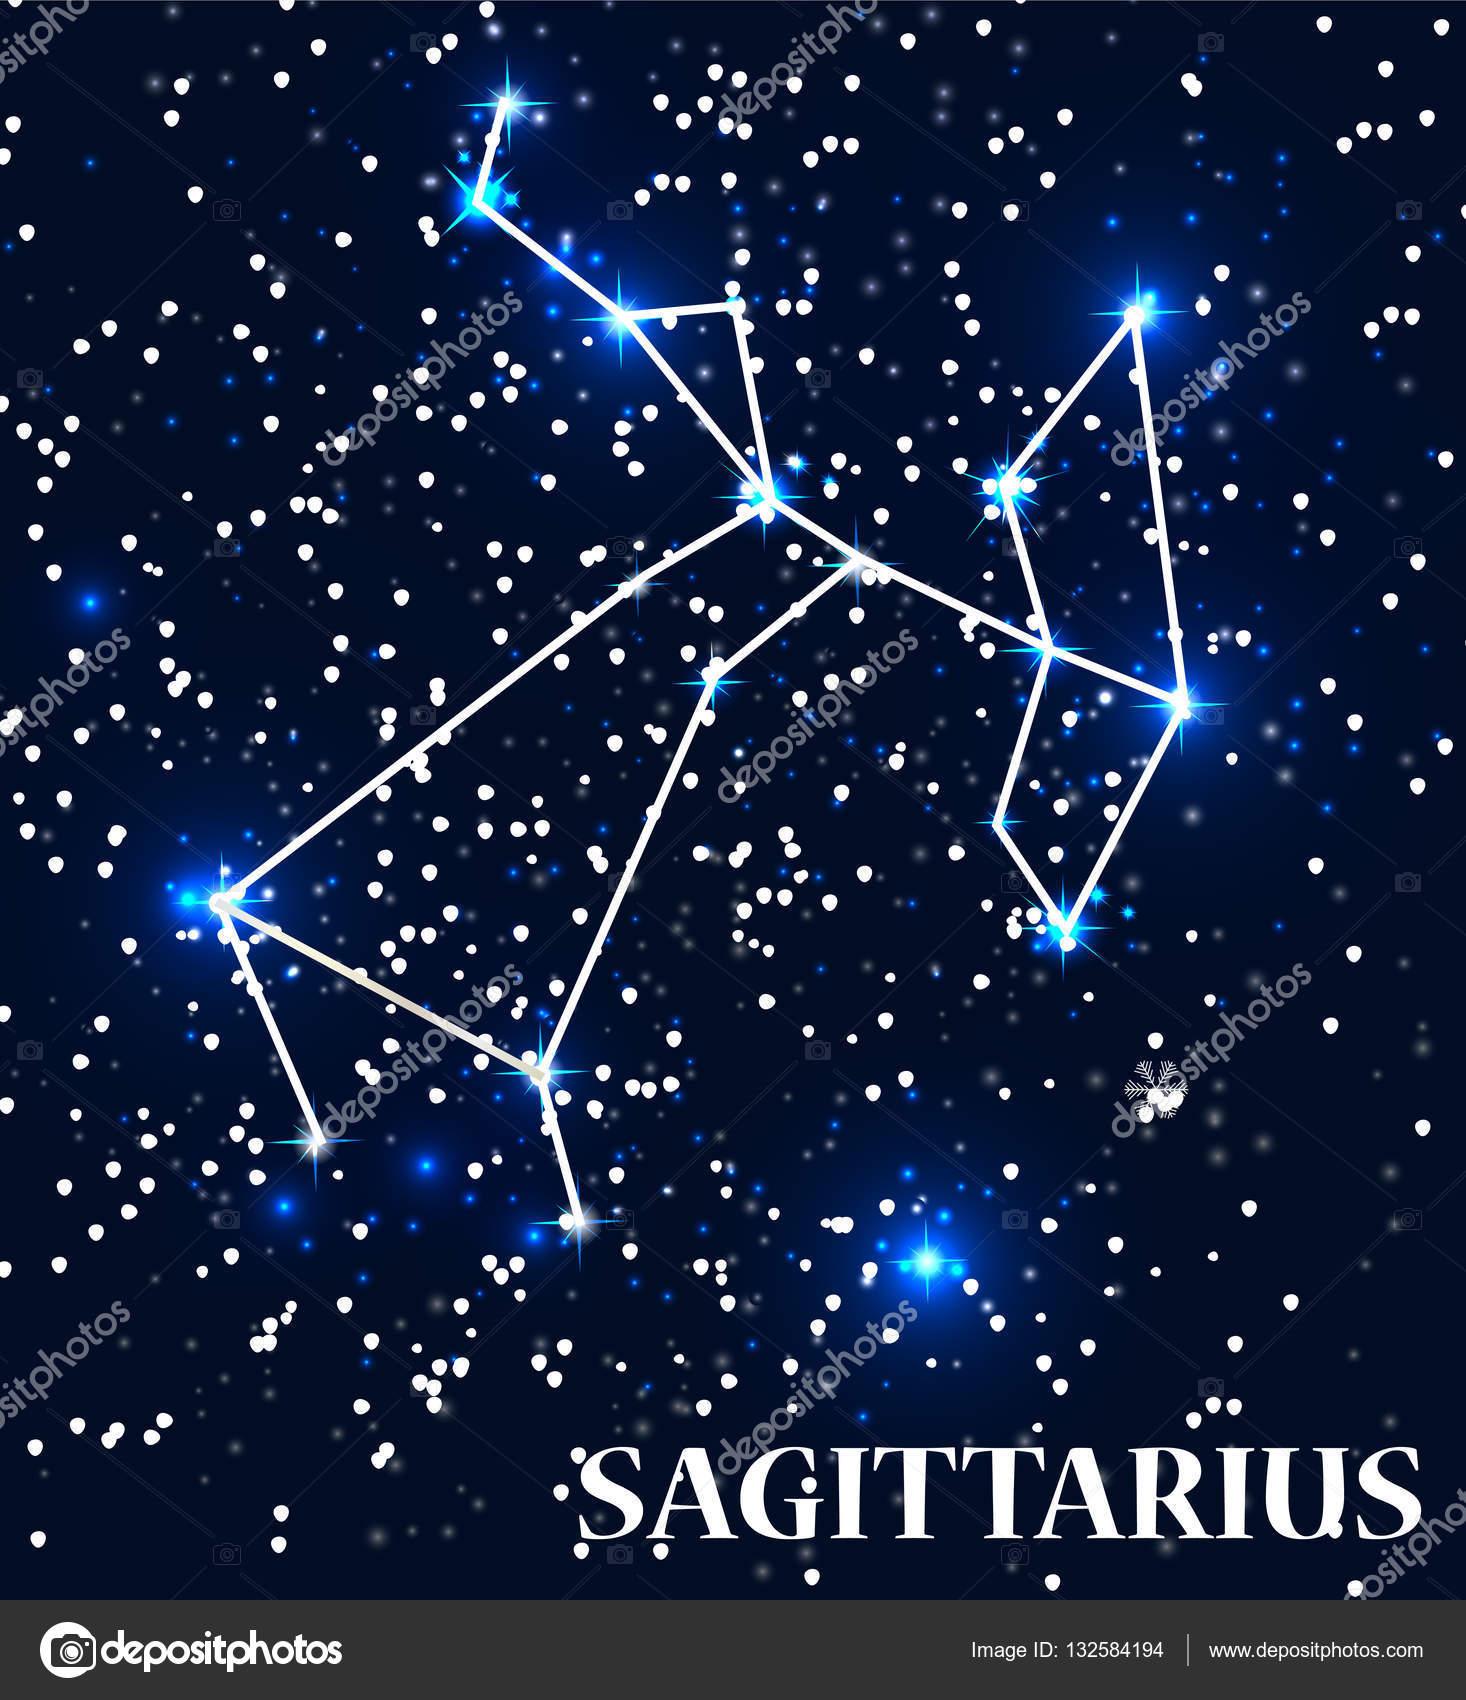 about sagittarius zodiac sign